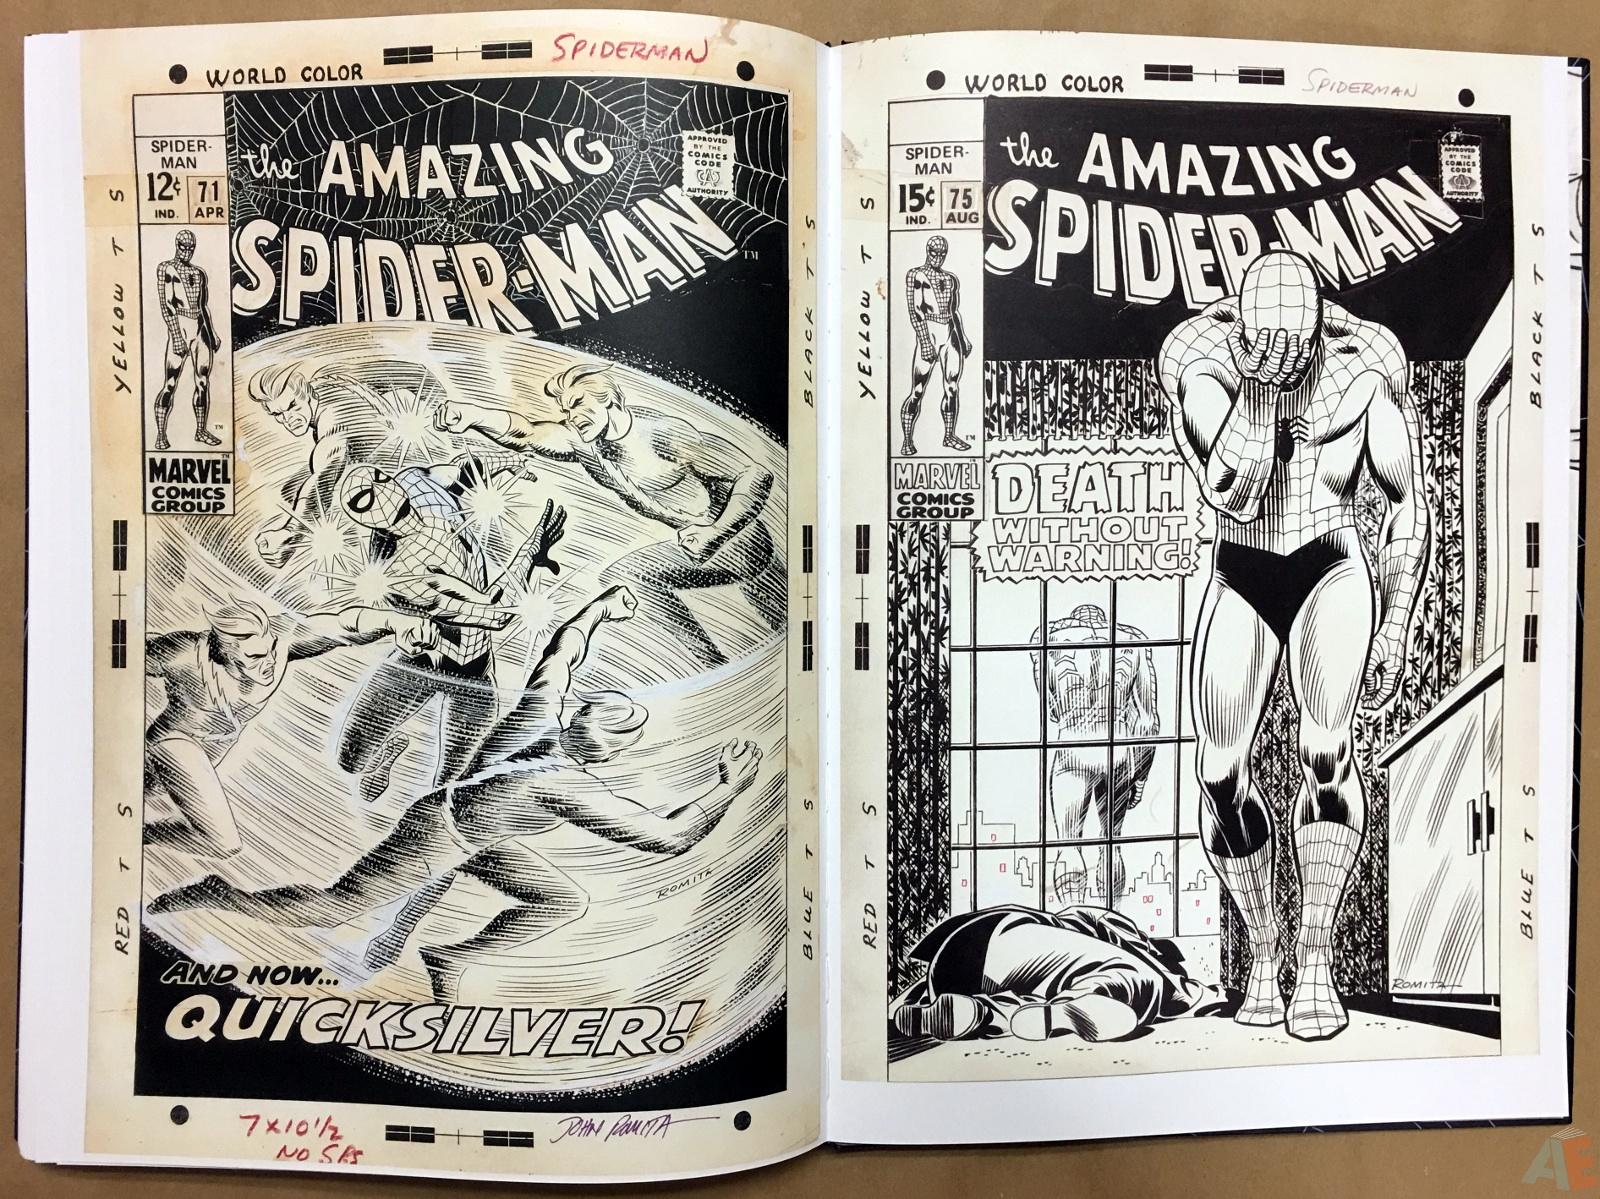 John Romita's The Amazing Spider-Man Artist's Edition 54